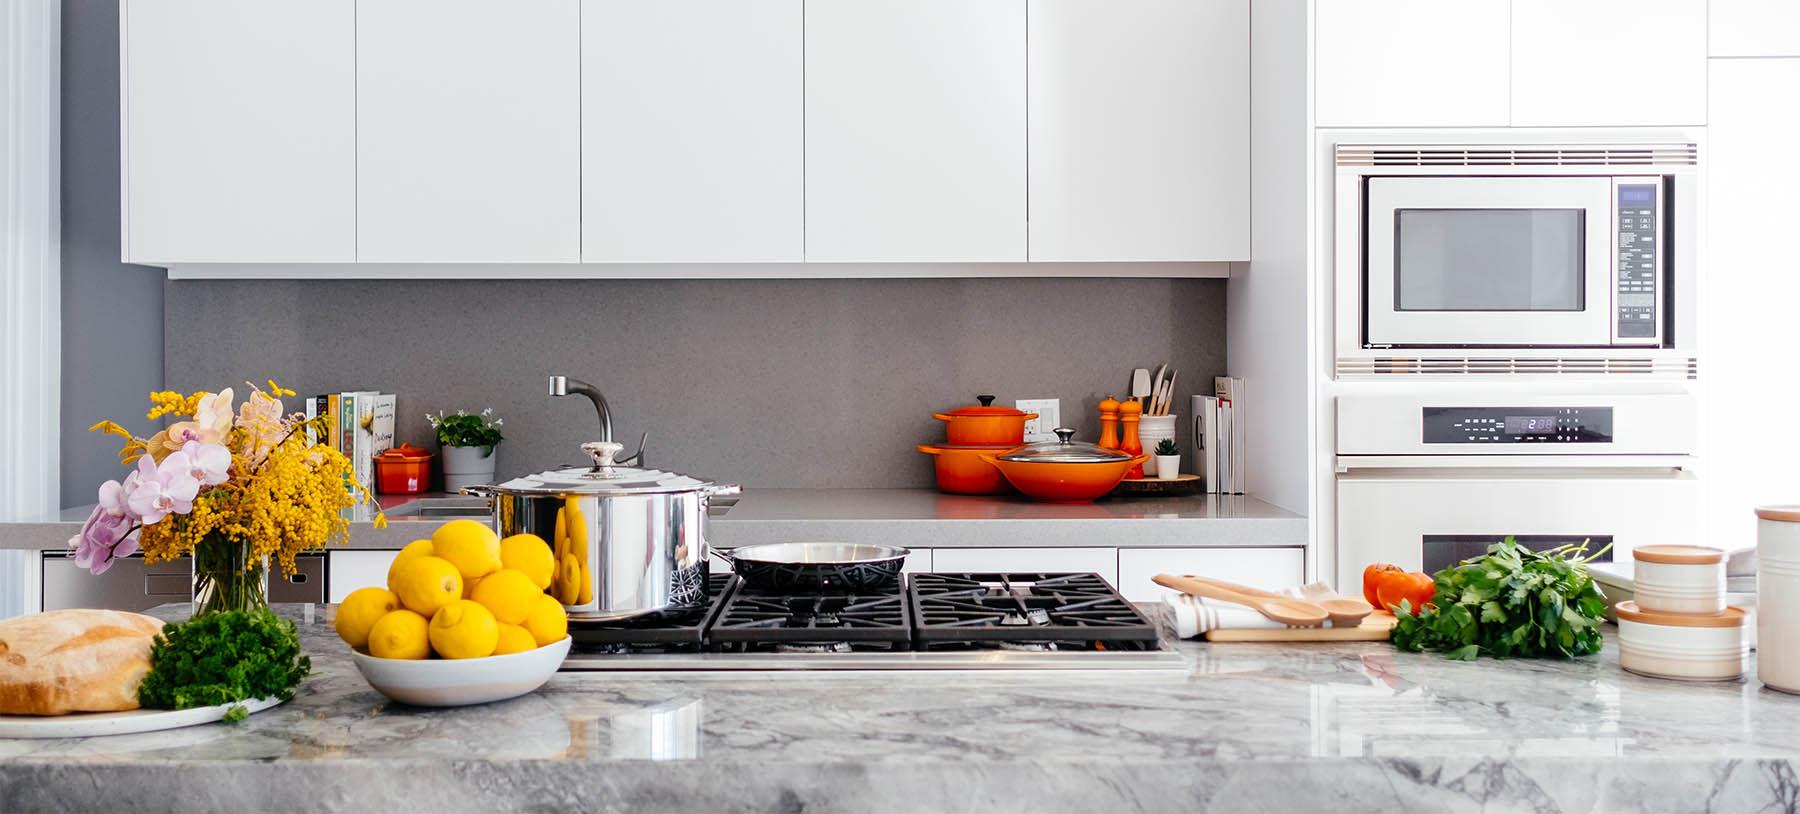 About Modern Houseware - Canadian Home Goods Wholesaler